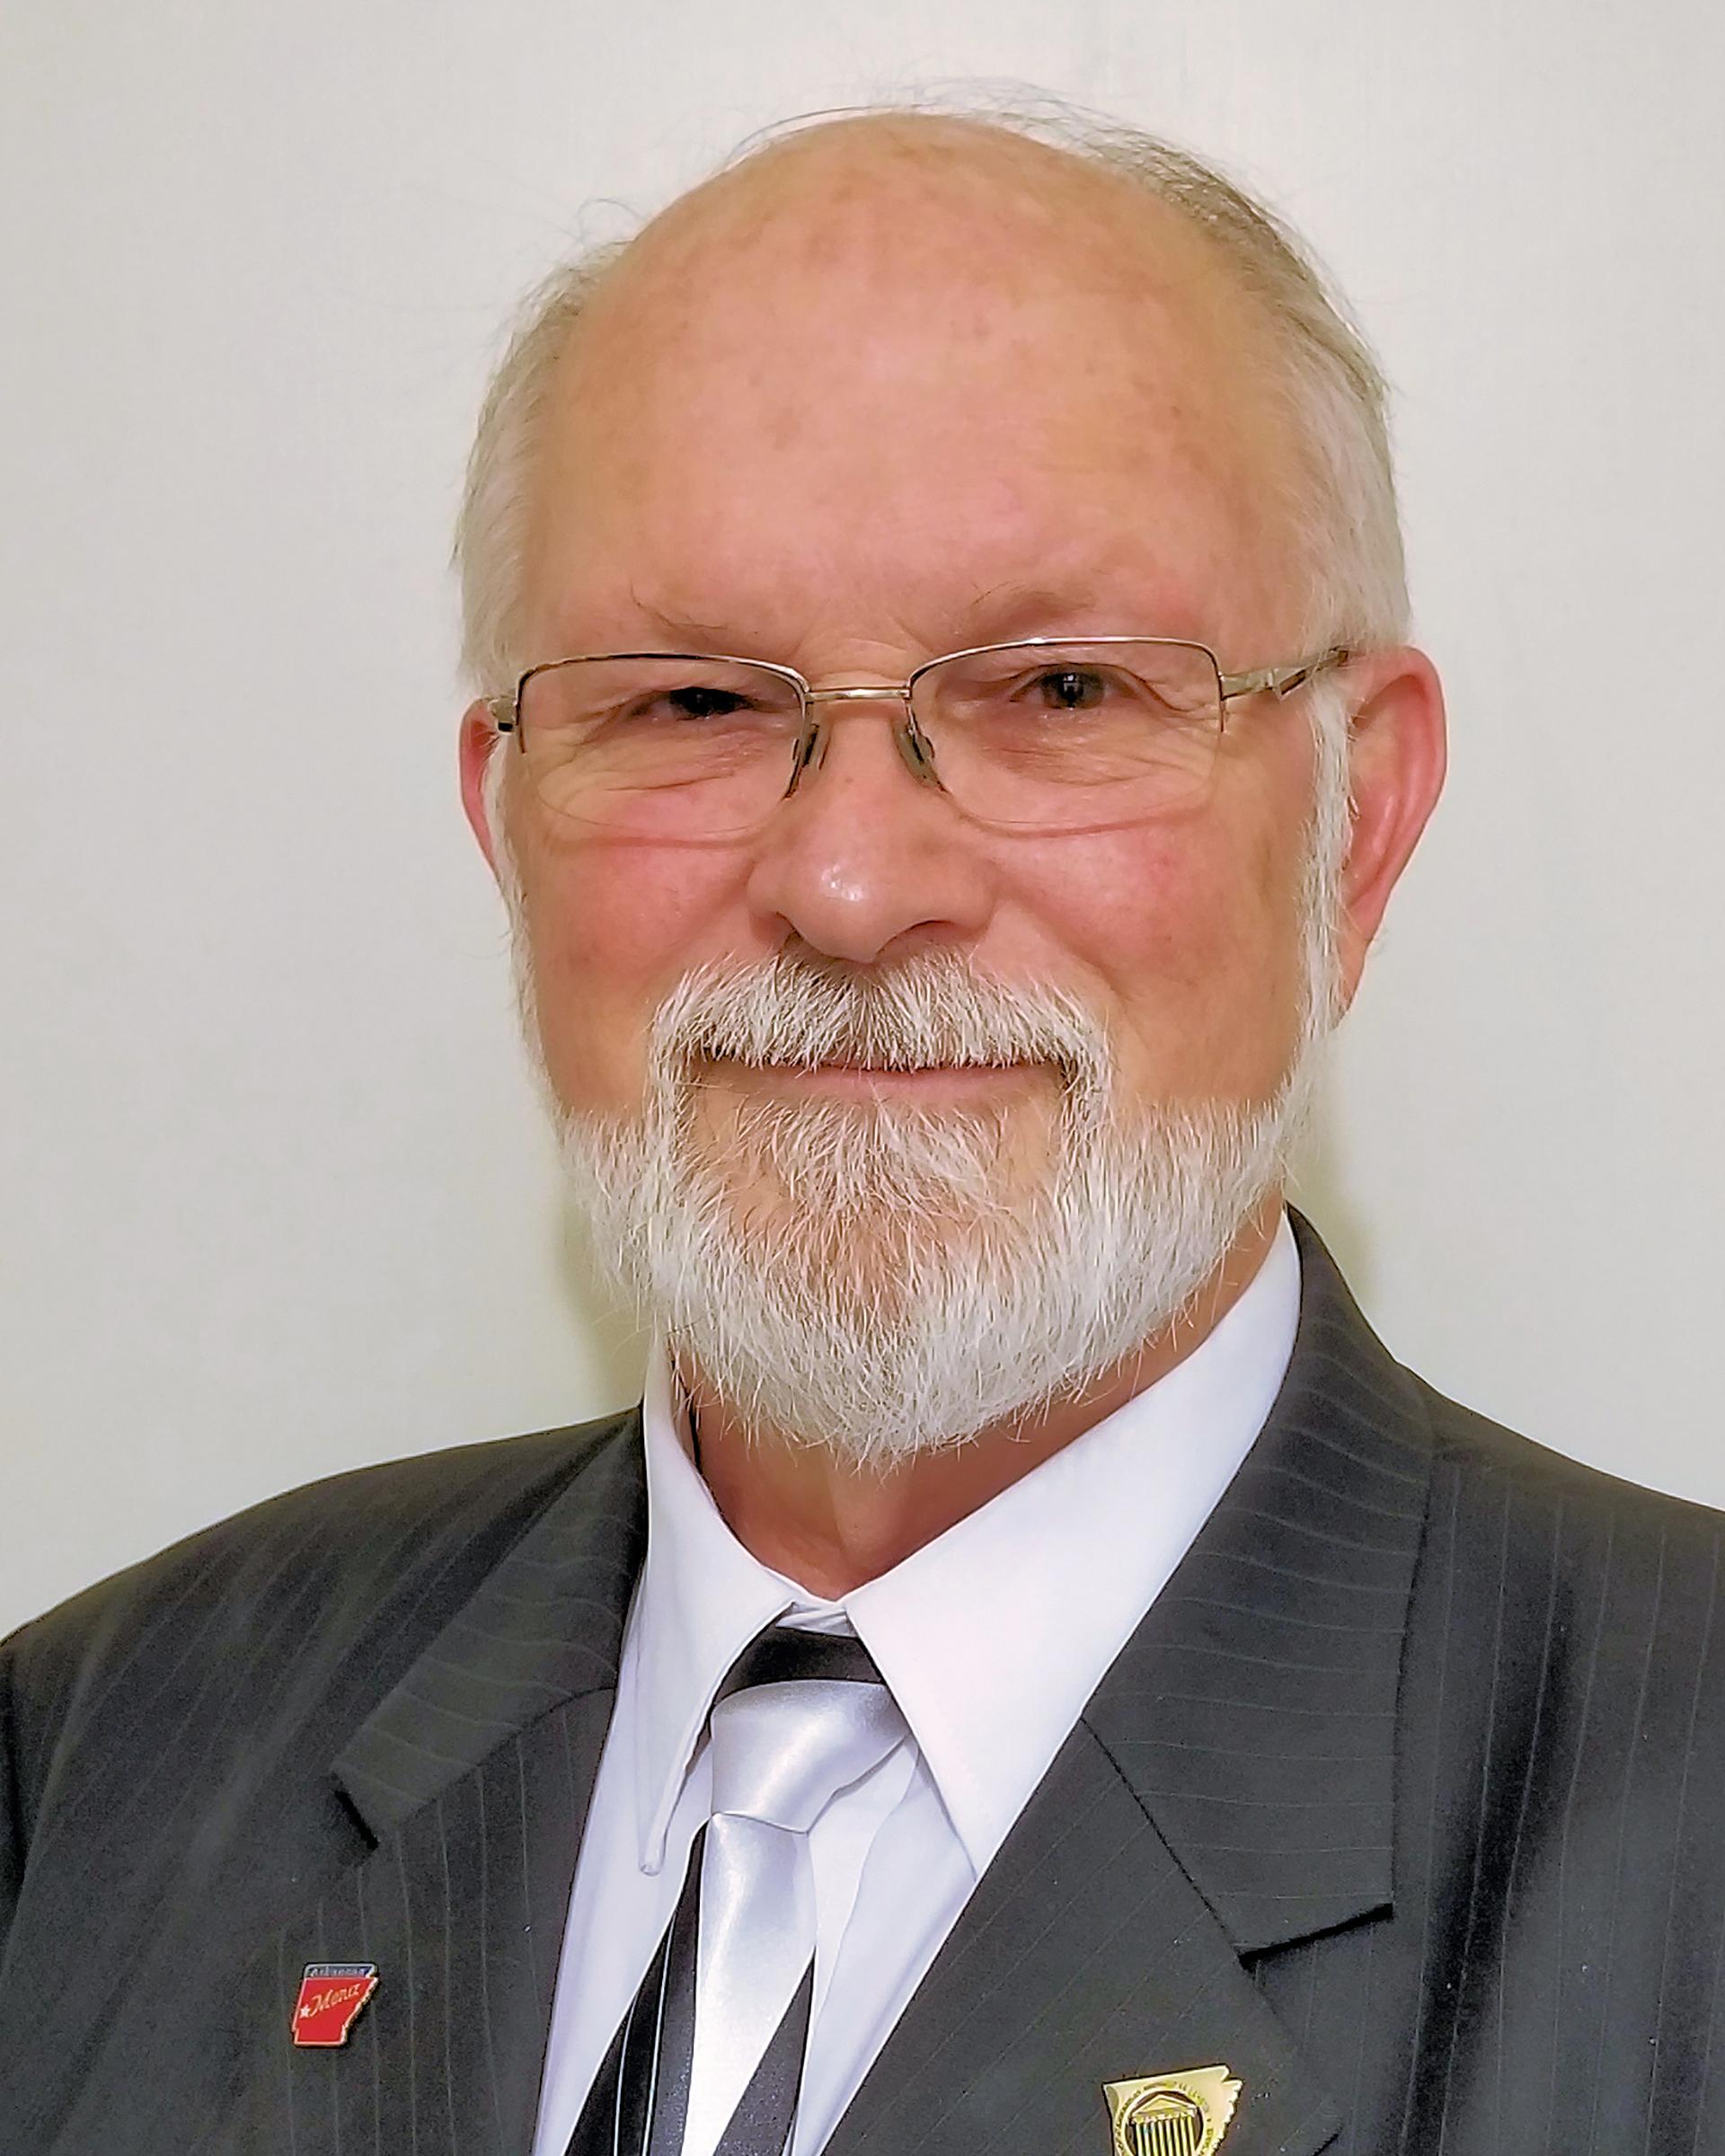 Council Member James E. Turner